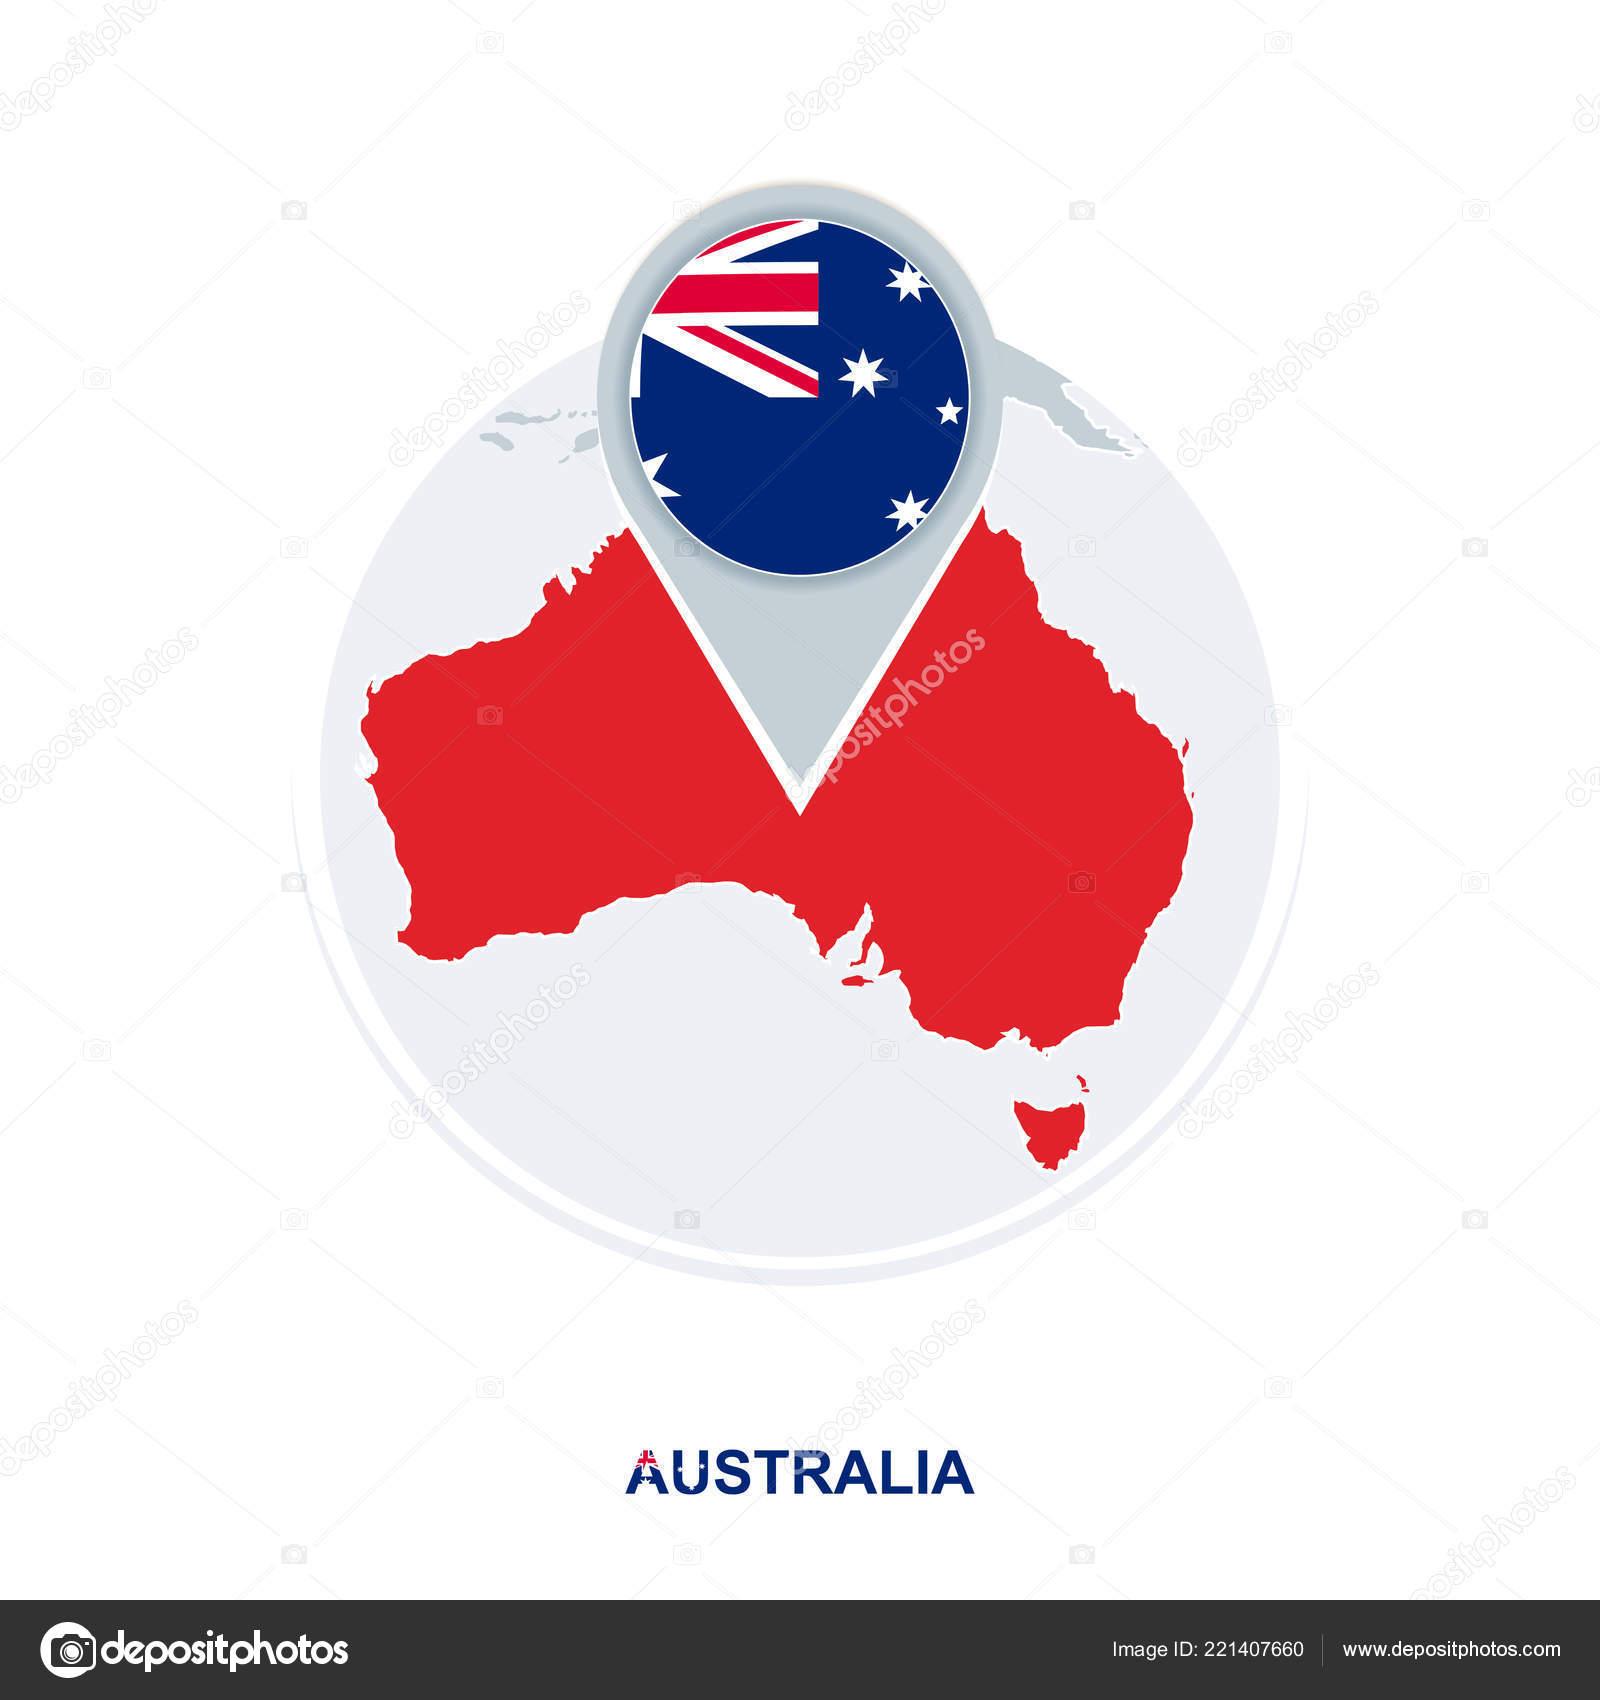 Australia Map Icon.Australia Map Flag Vector Map Icon Highlighted Australia Stock